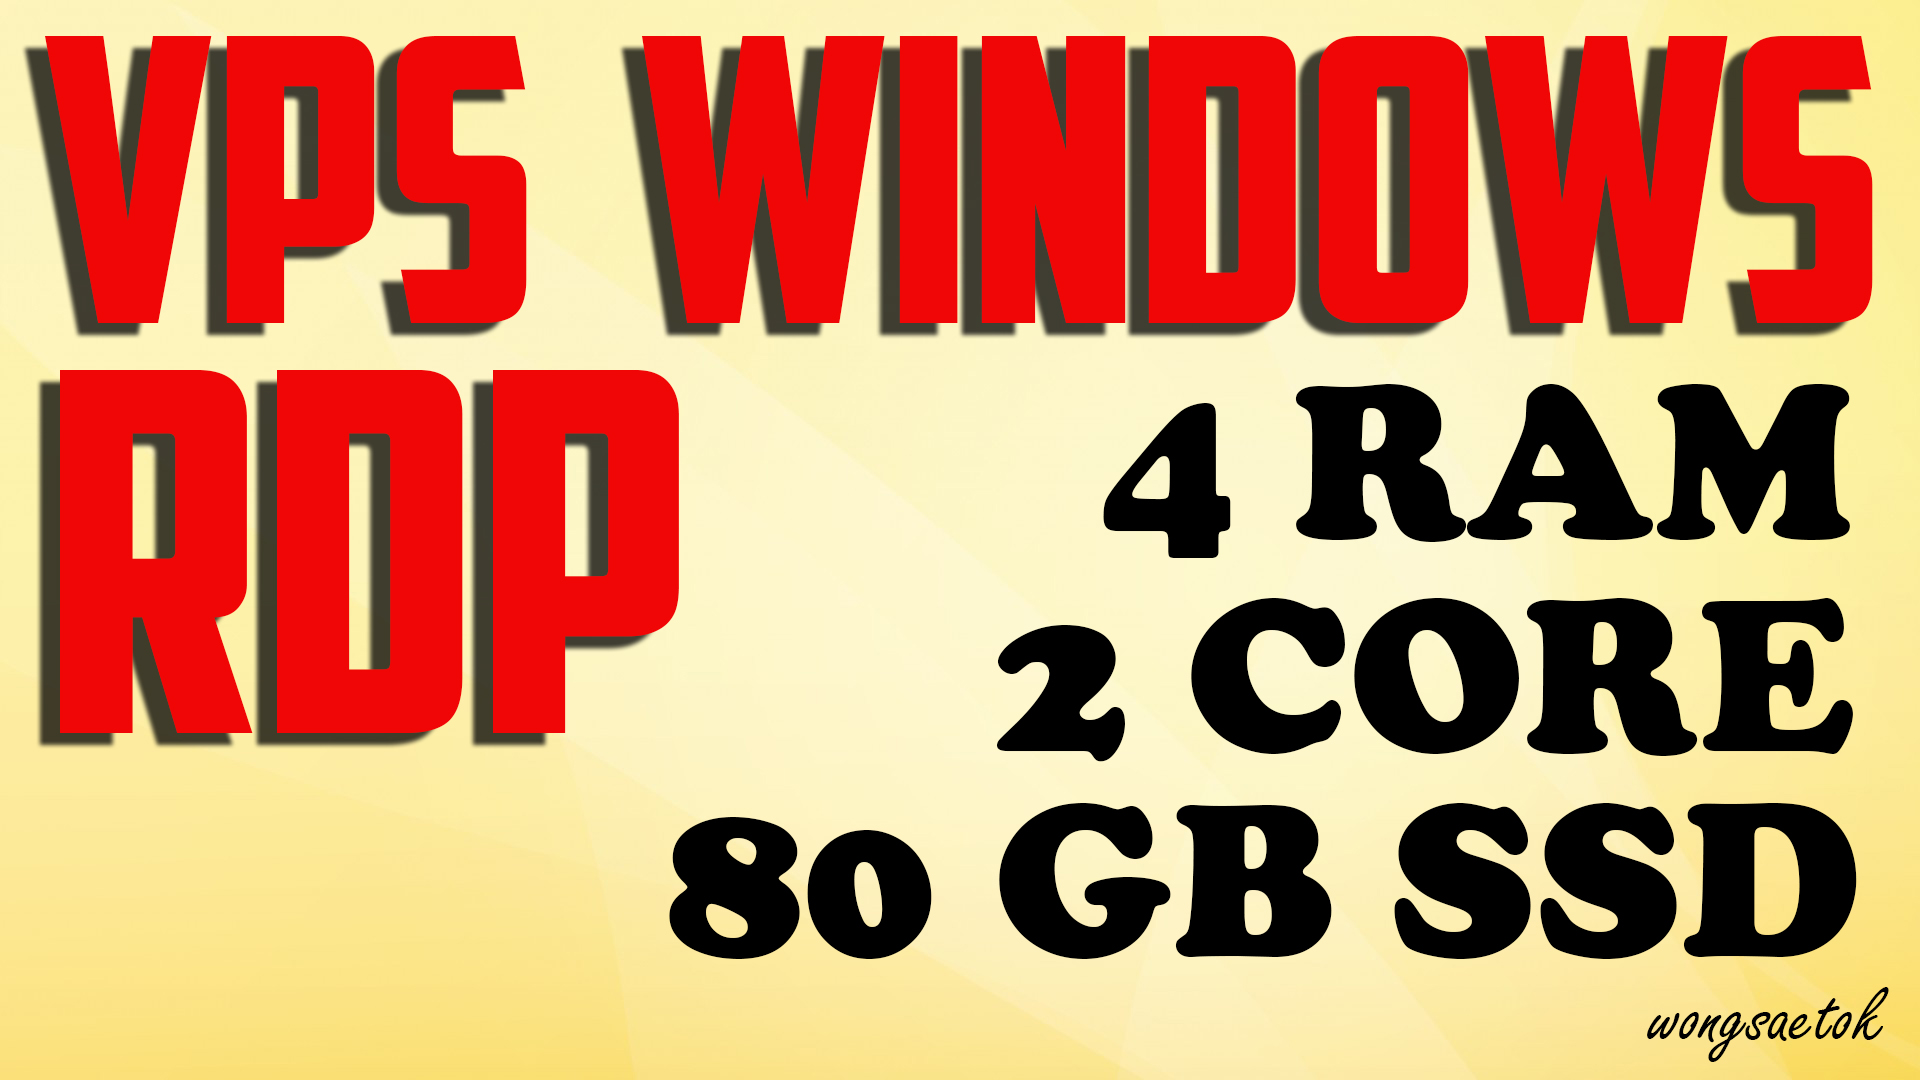 VPS RDP Windows 4 GB RAM 2 CPUs 80 GB SSD